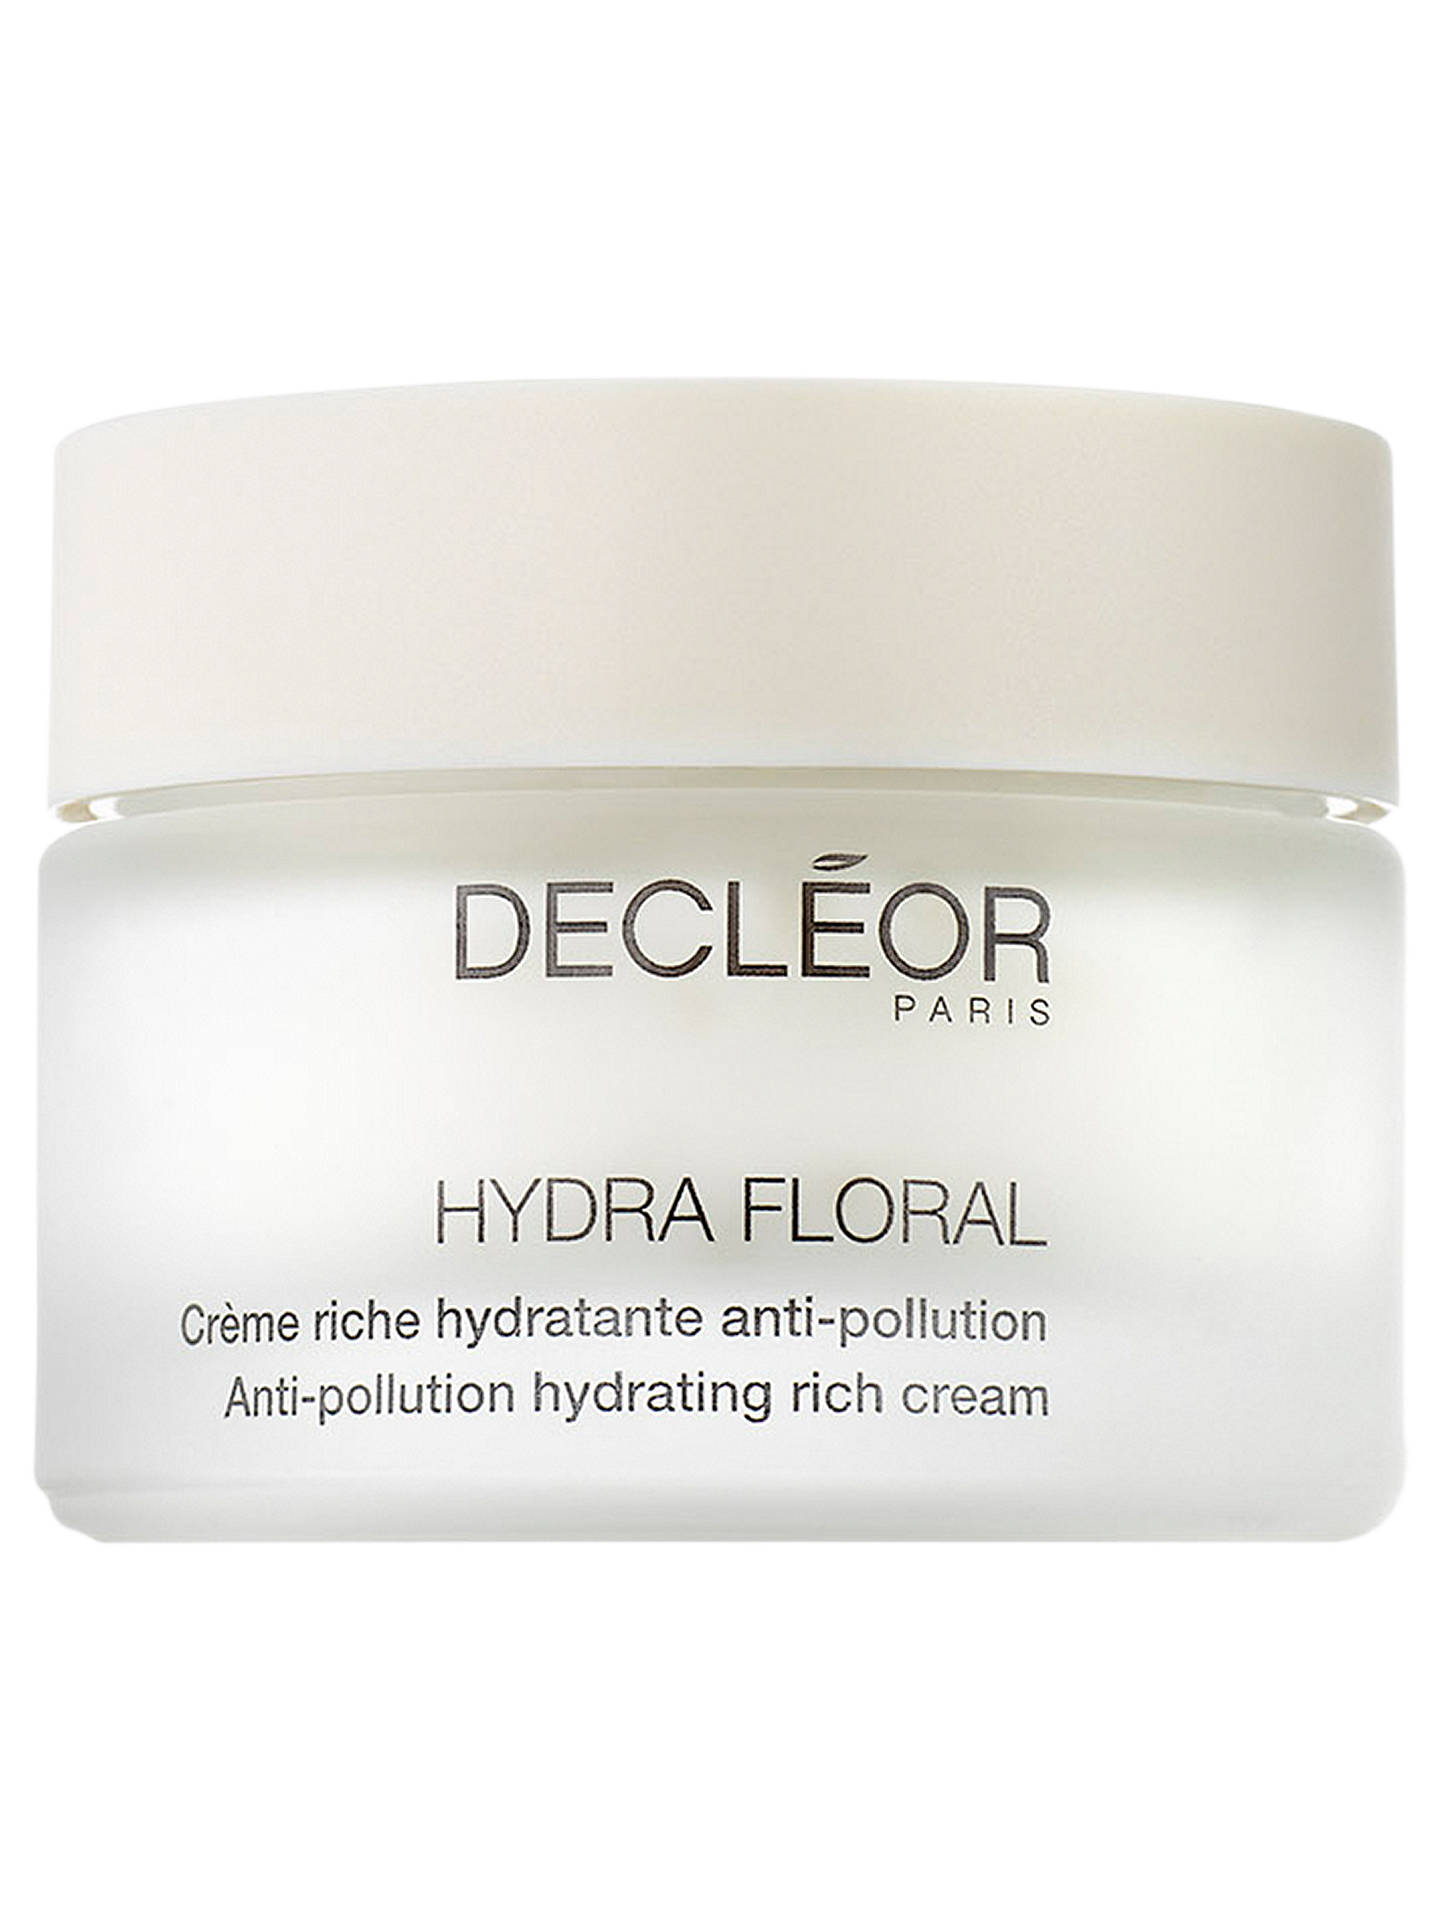 decleor hydra floral rich cream